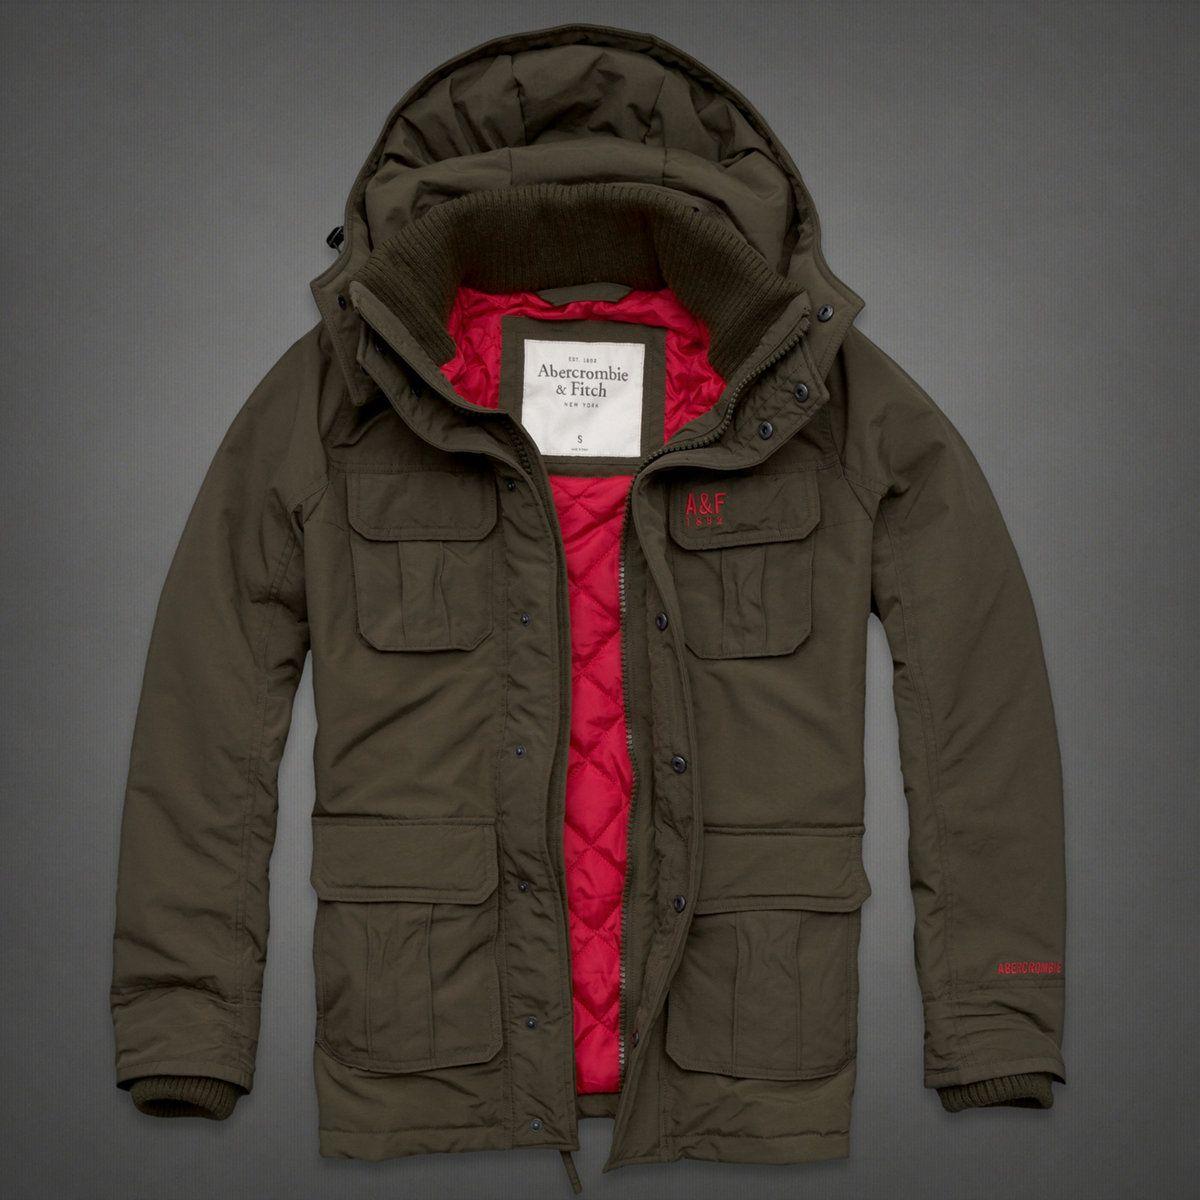 Abercrombie Com Men S Coats And Jackets Men S Coats Jackets Mens Outfits [ 1200 x 1200 Pixel ]